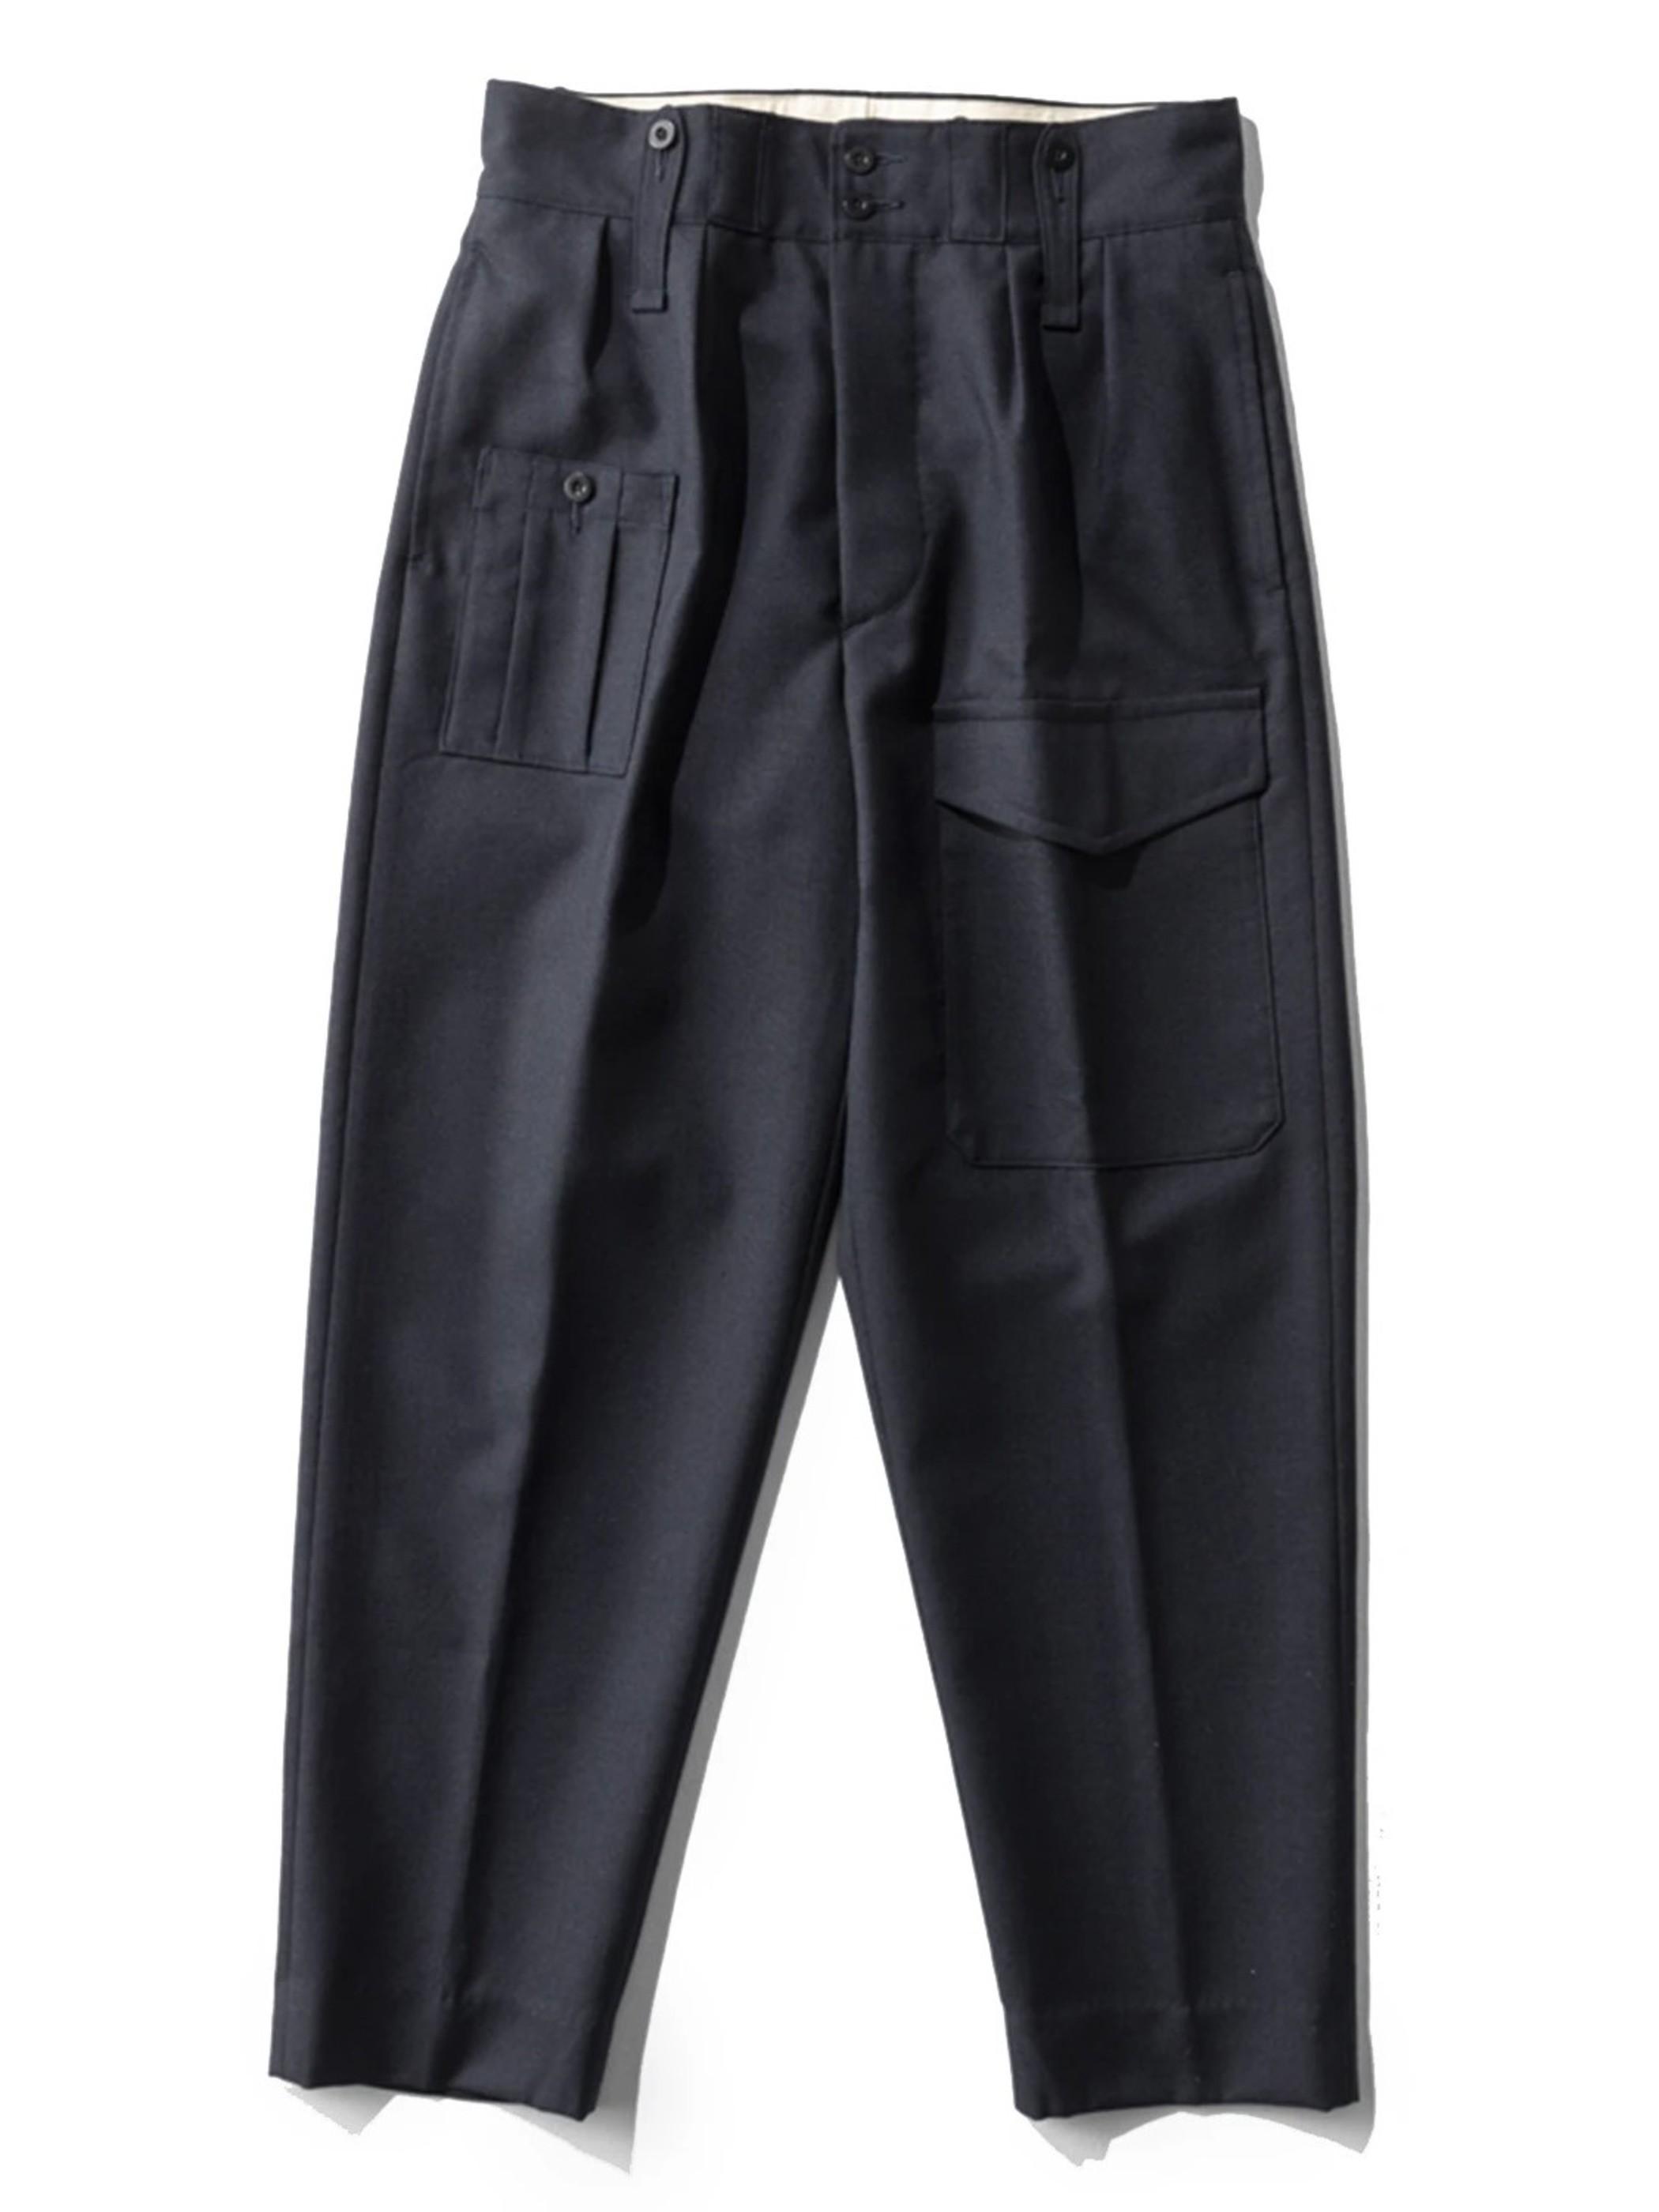 NIGEL CABOURN   British Army Pants Wool